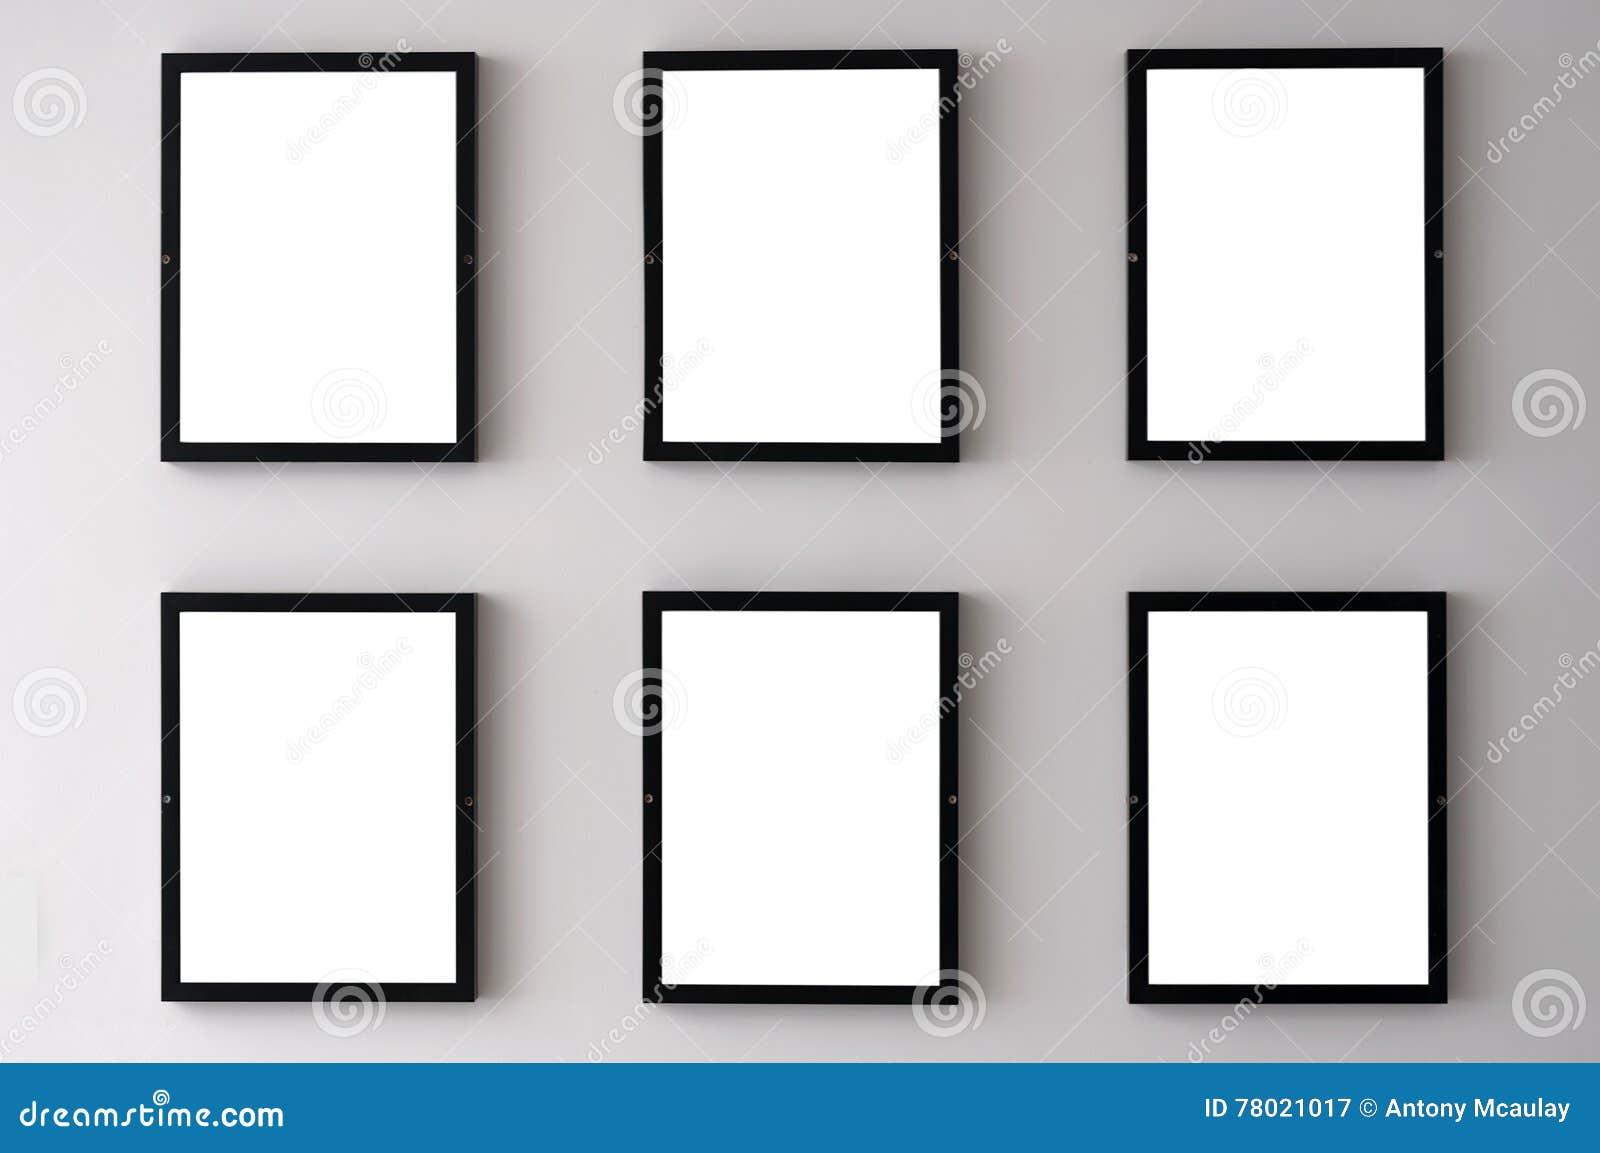 wei e wand bilderrahmen stockbild bild von leer rand 78021017. Black Bedroom Furniture Sets. Home Design Ideas